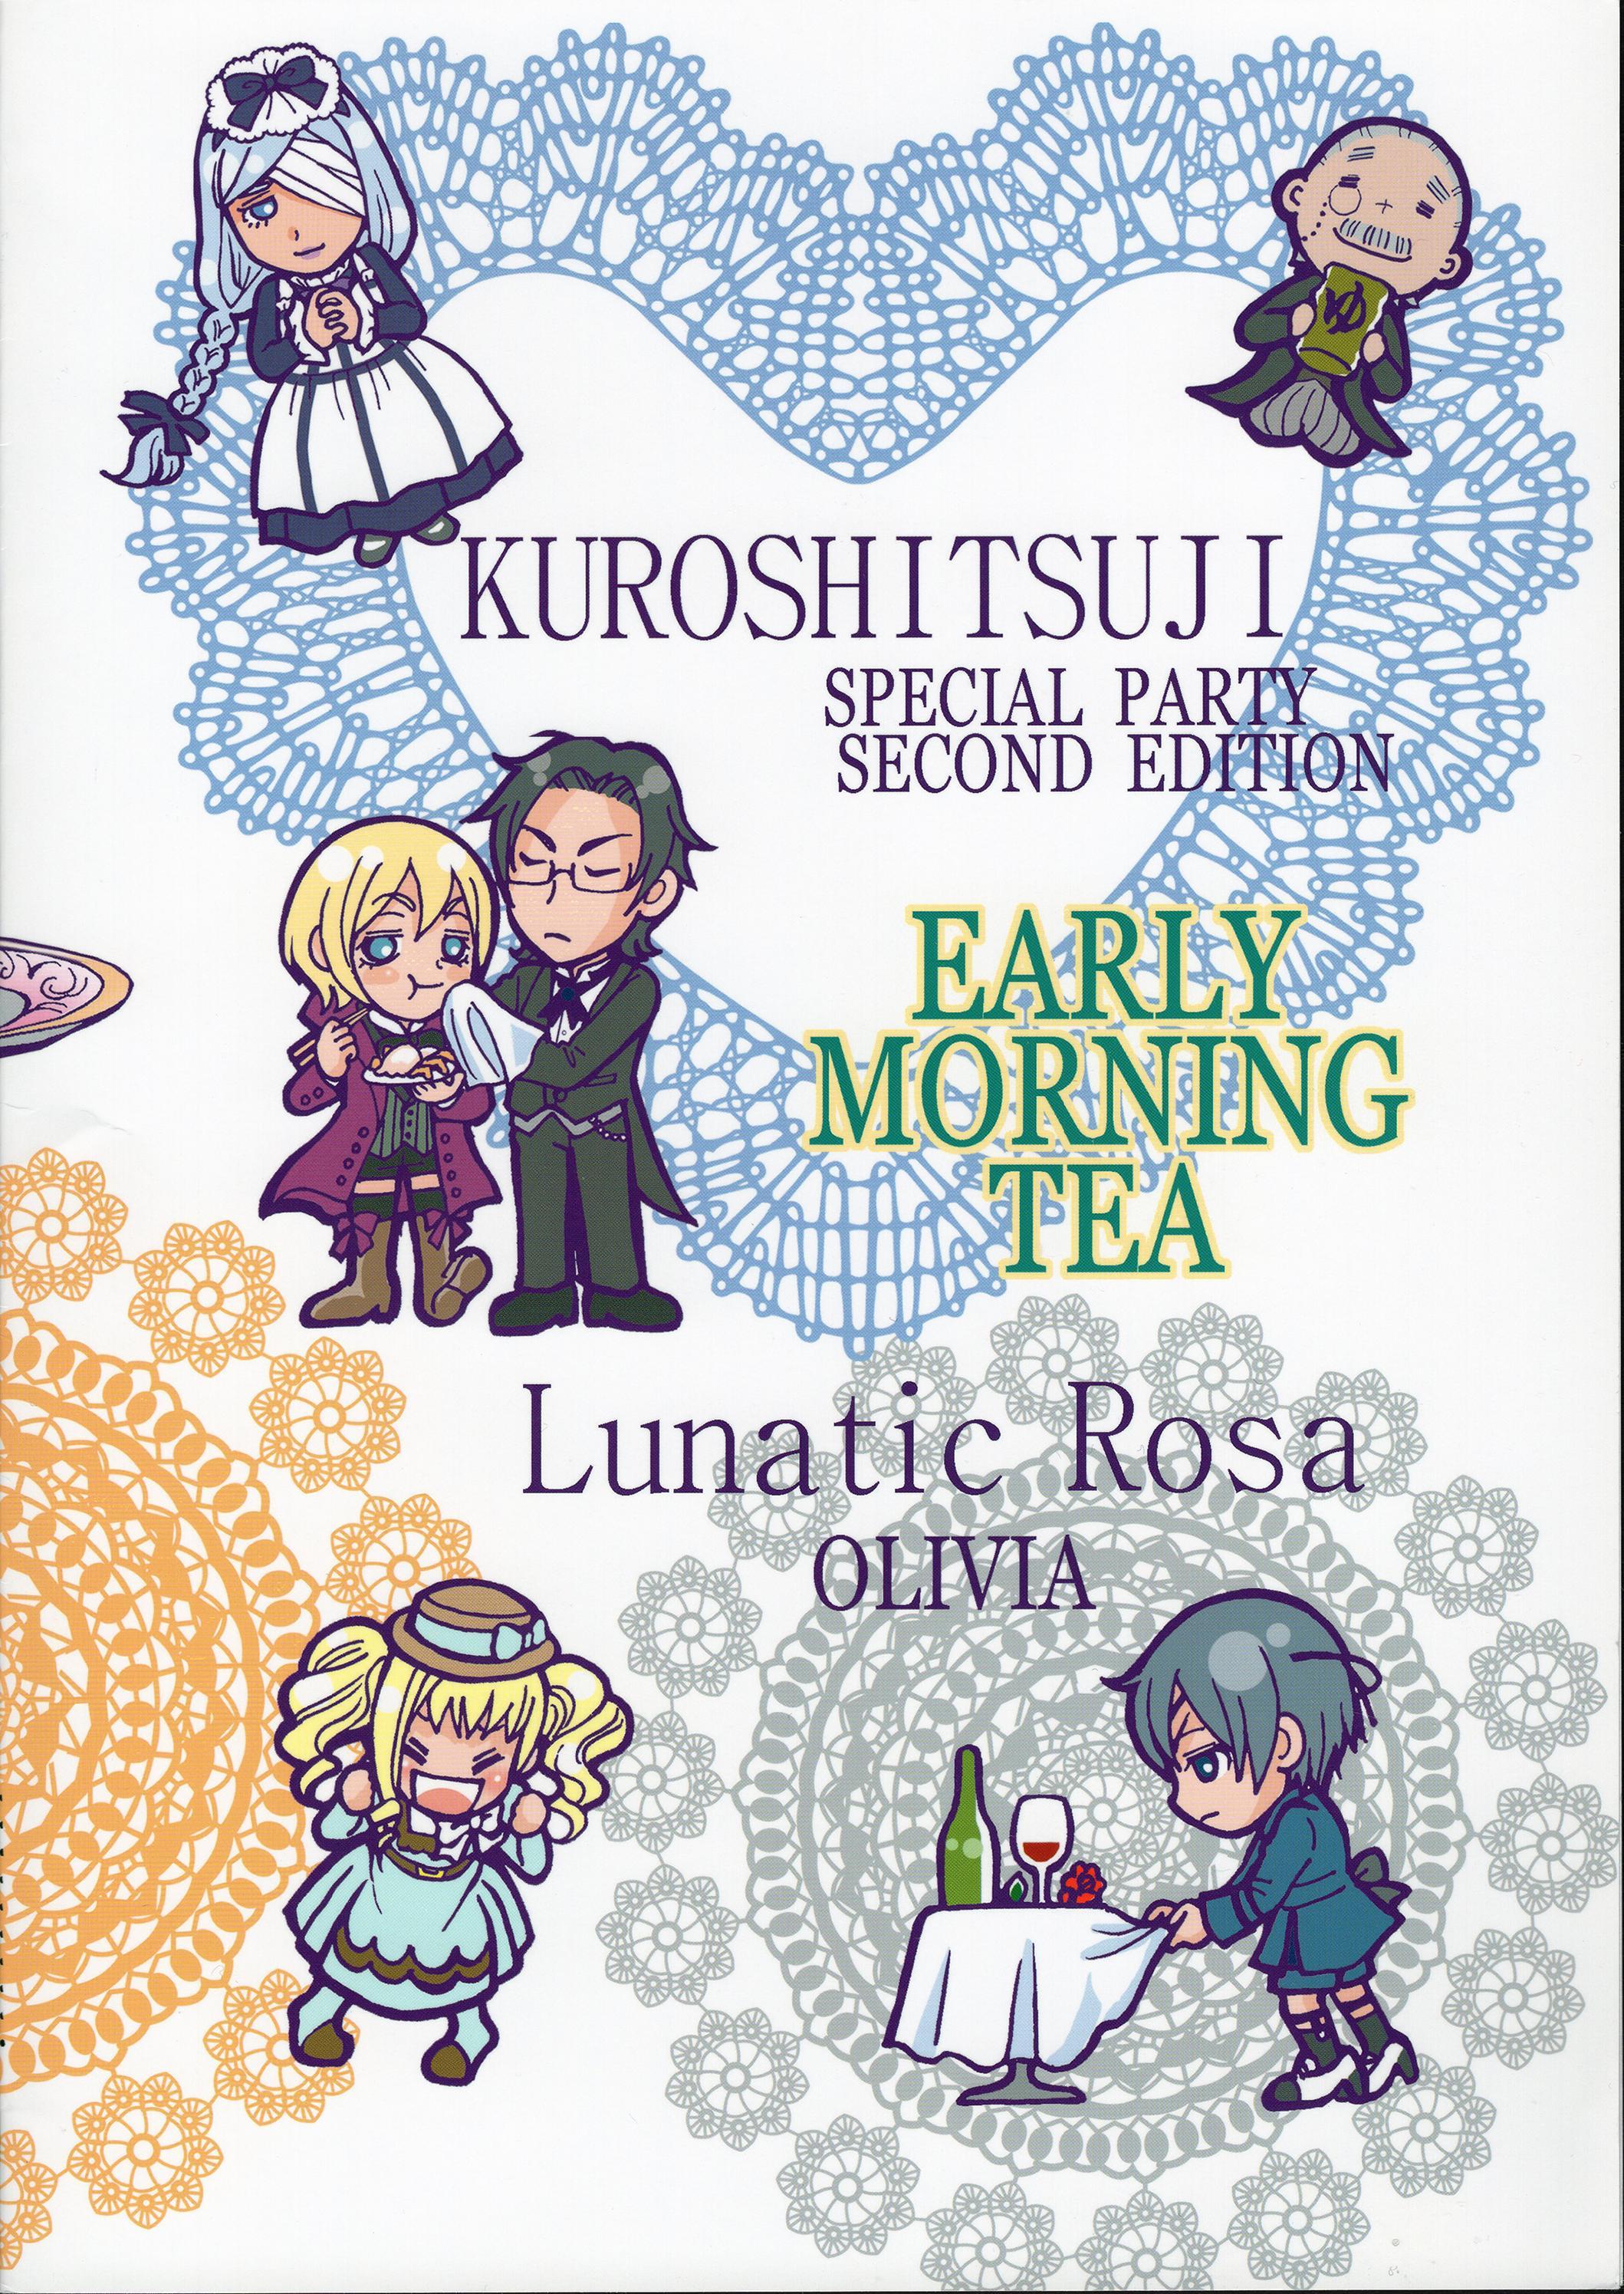 Kuroshitsuji (Black Butler) DJ - Early Morning Tea Ch.0